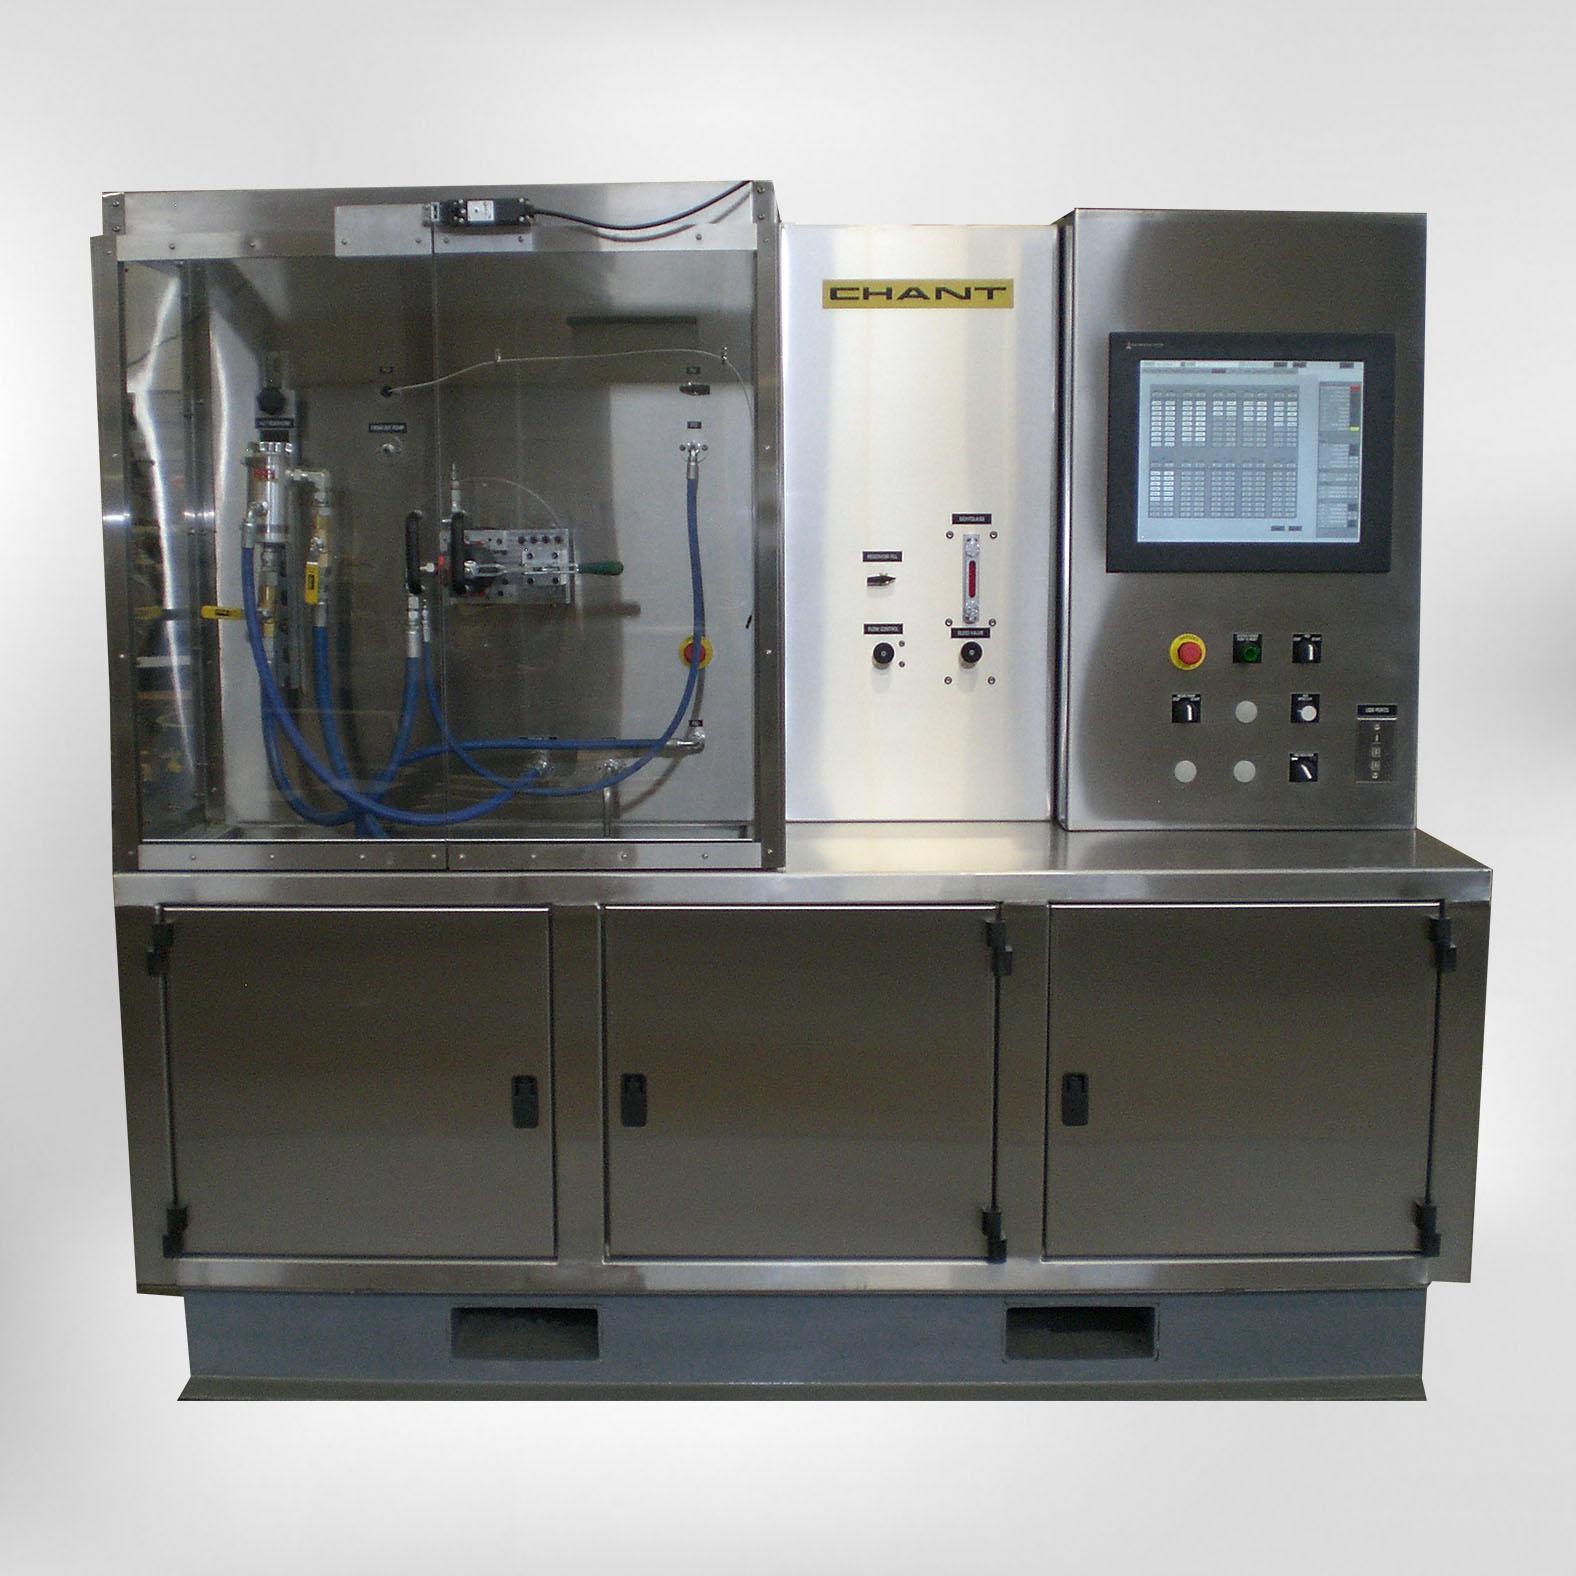 10358-01 Power Steering Pump Test Stand